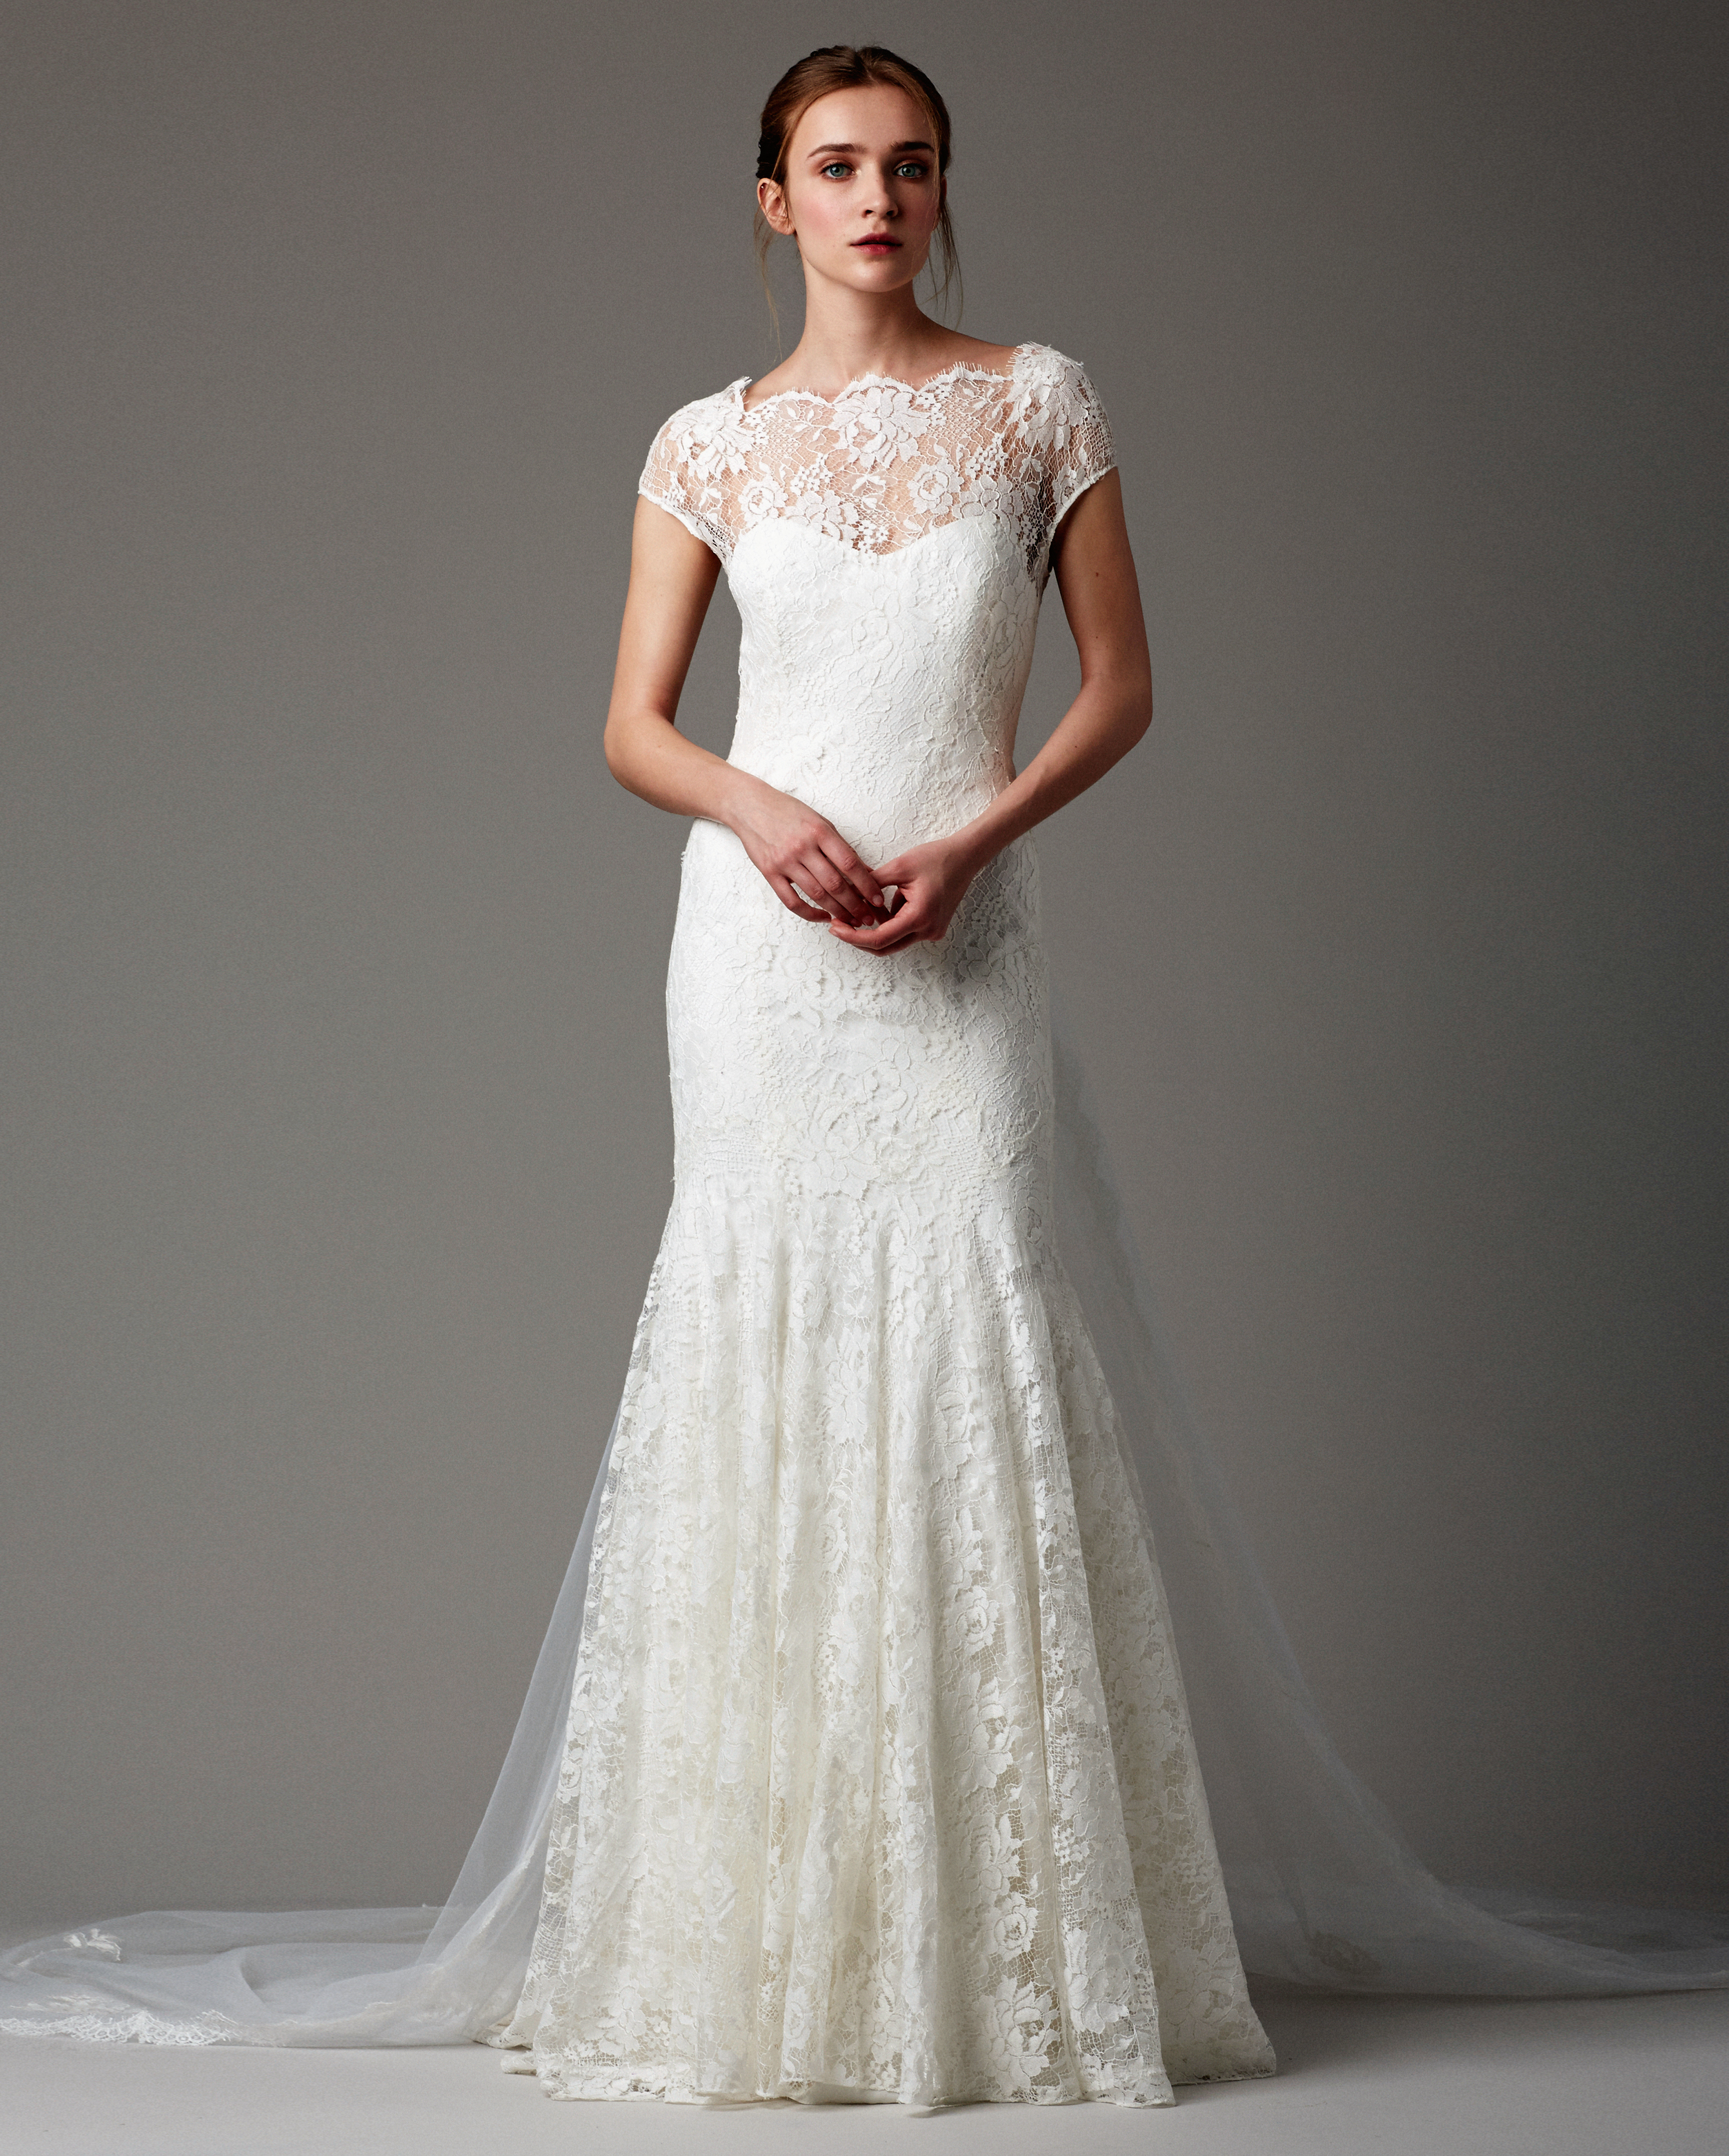 50-states-wedding-dresses-alabama-lela-rose-0615.jpg